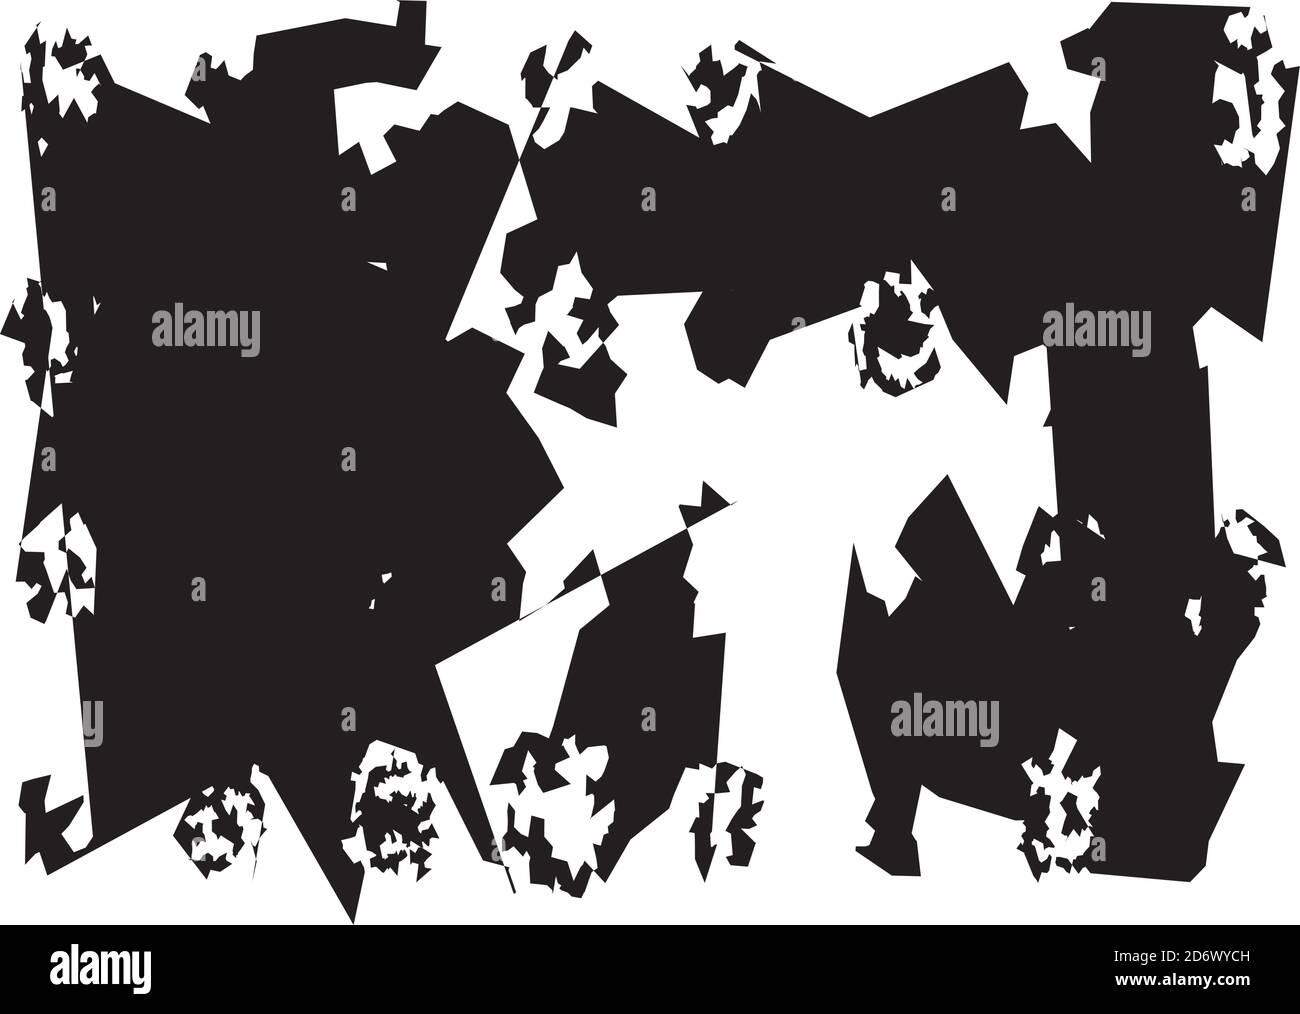 Weird, Strange generated random edgy Shapes. Asymmetric Abstract art Vector illustration. Stock Vector